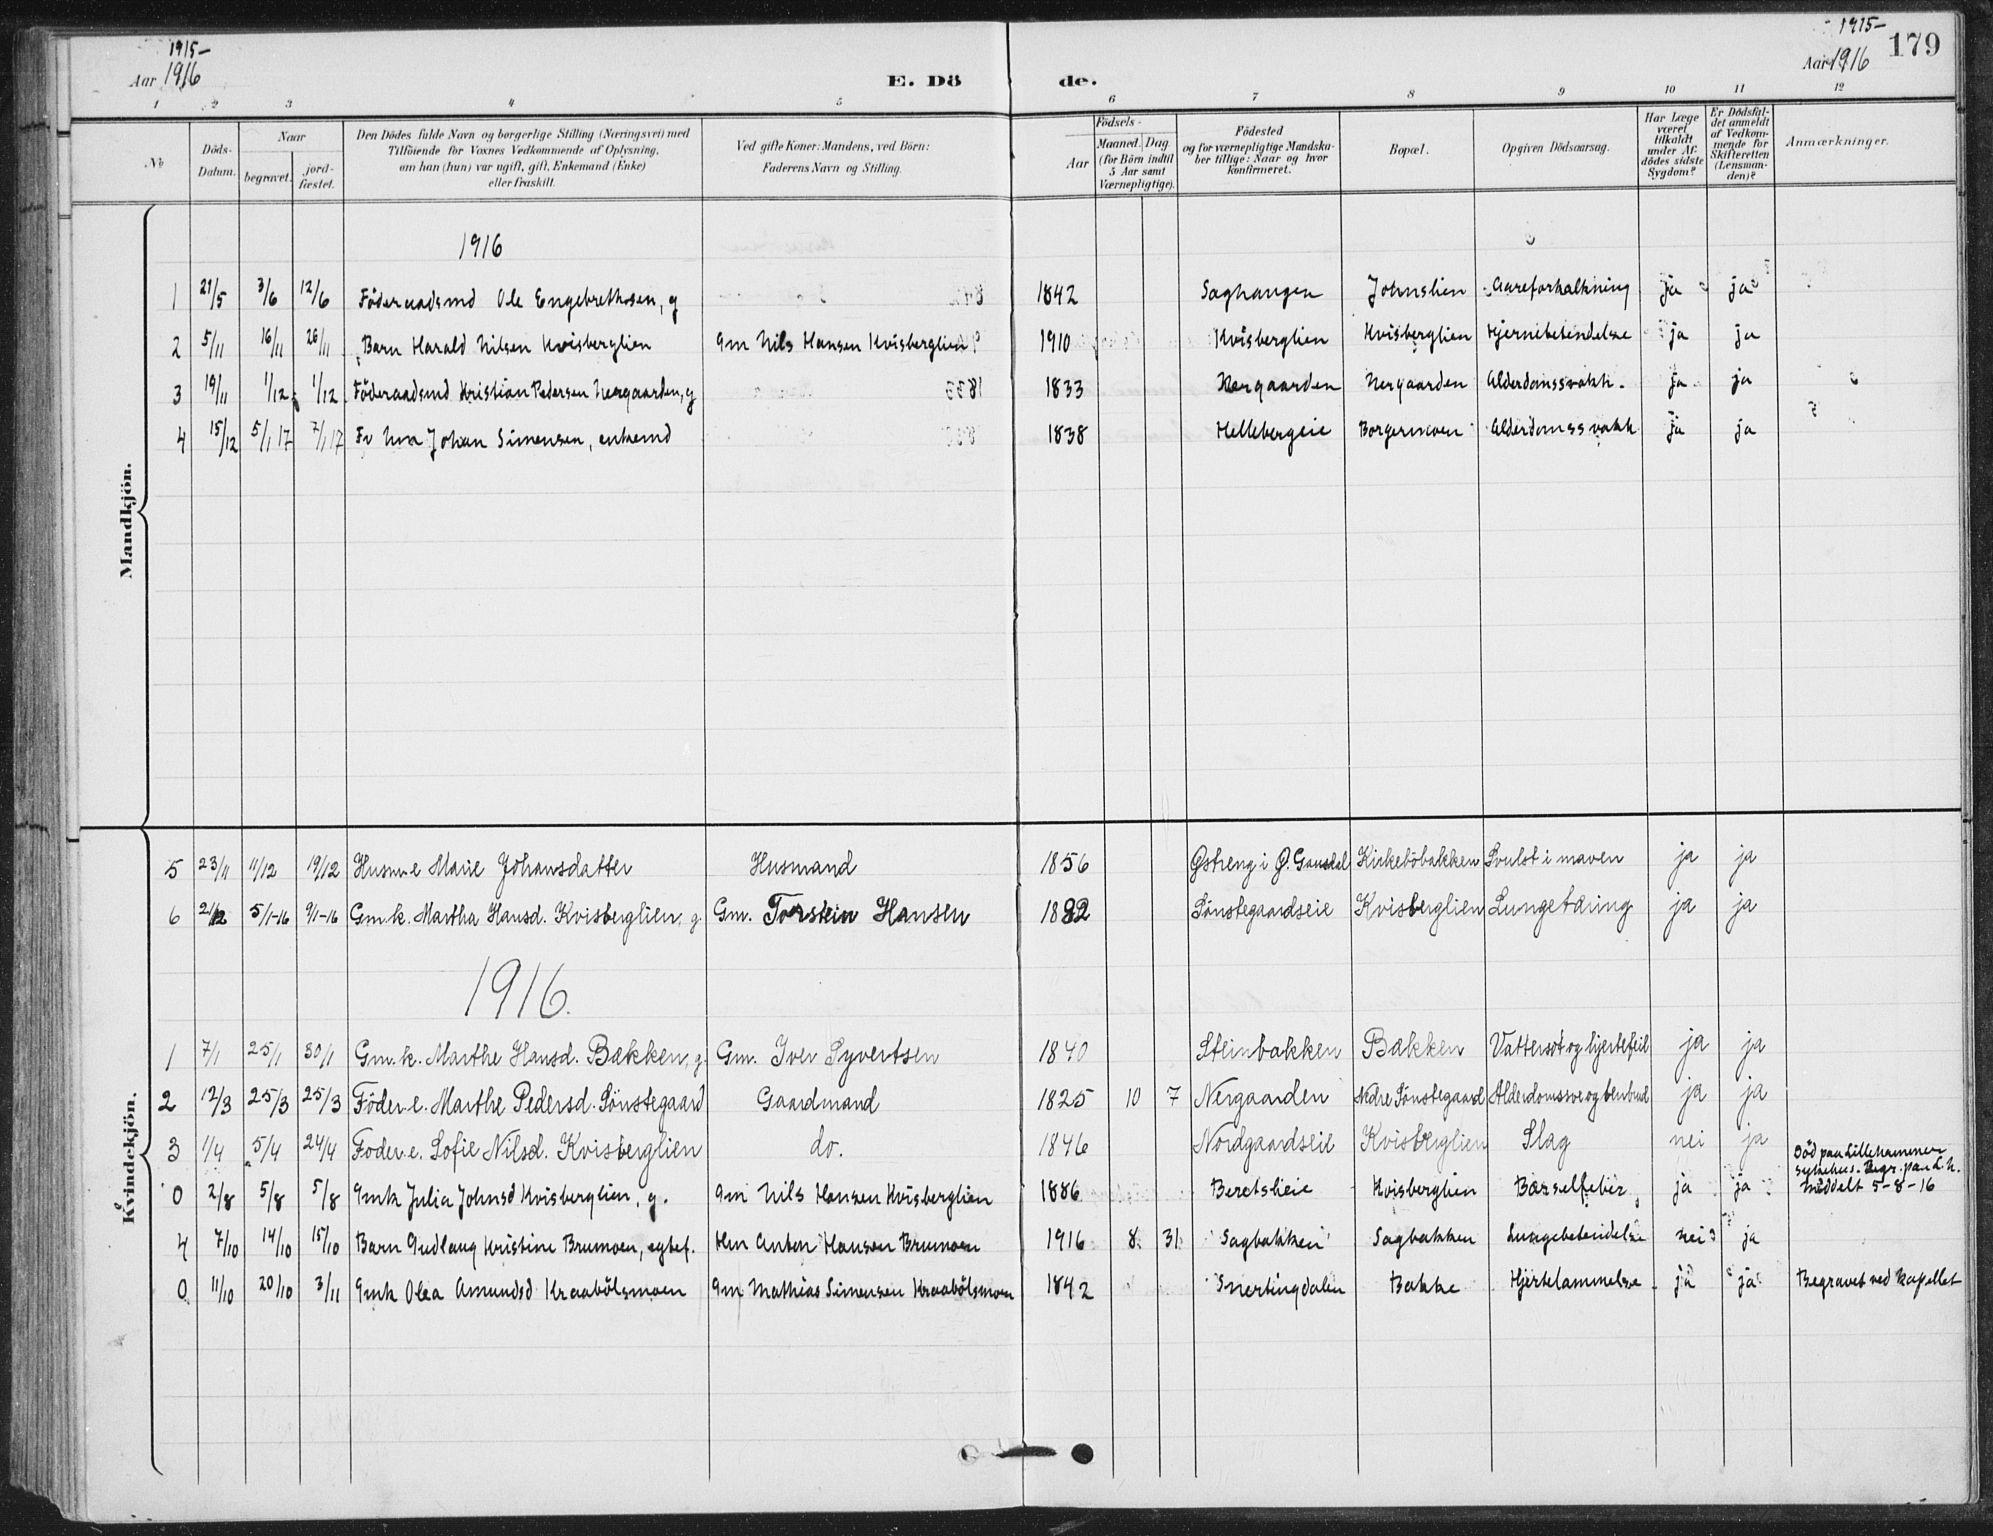 SAH, Vestre Gausdal prestekontor, Klokkerbok nr. 4, 1898-1939, s. 179